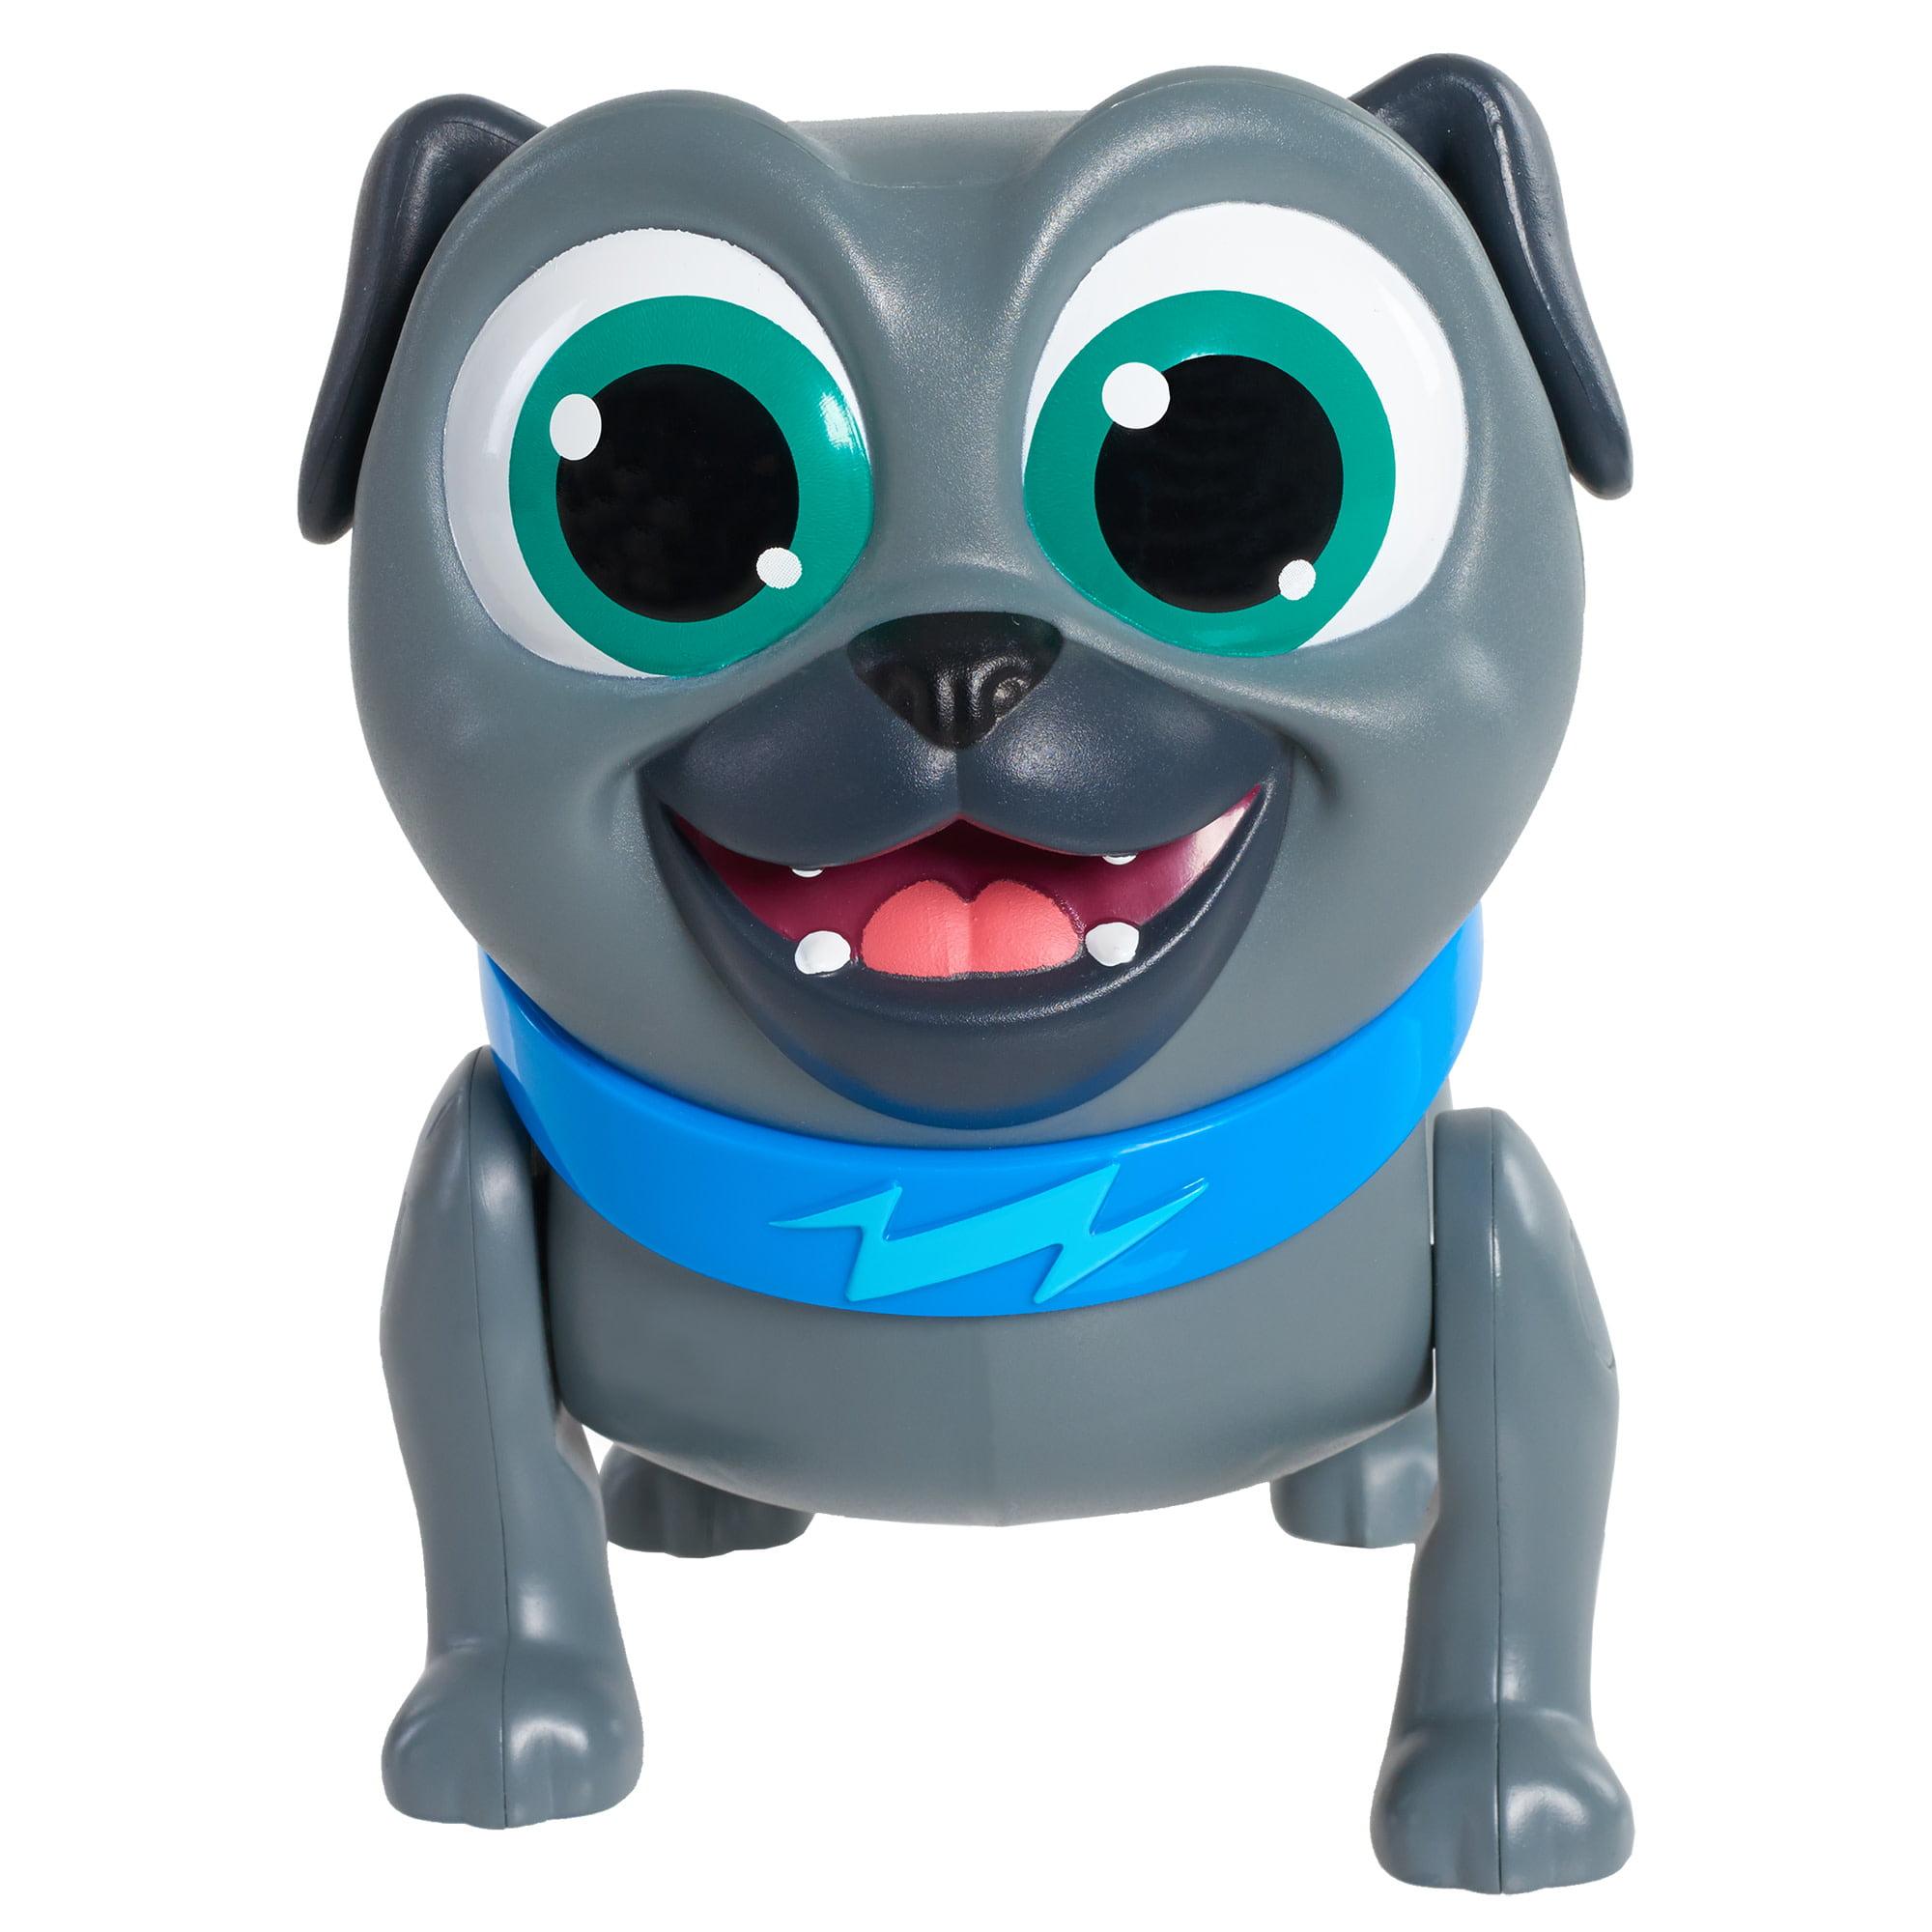 cde900863ca Puppy Dog Pals Surprise Action Figure - Bingo - Walmart.com